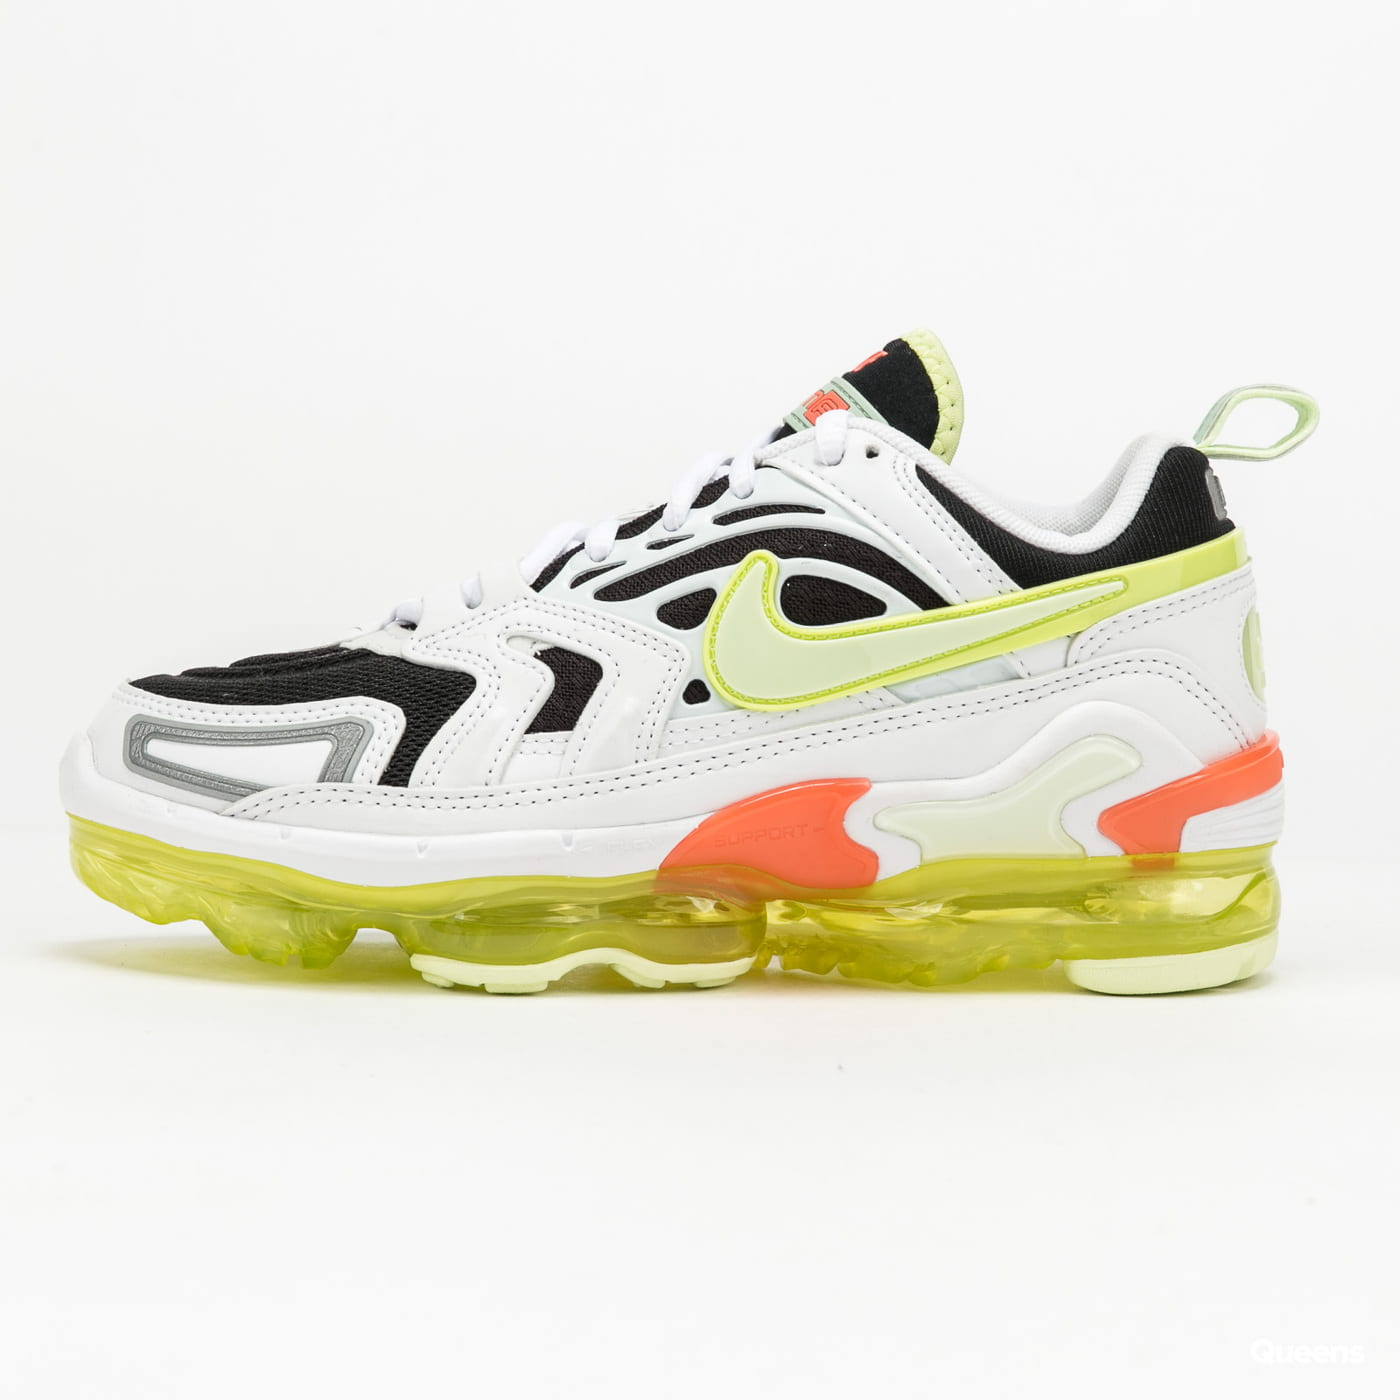 Nike W Air Vapormax EVO white / lime ice - black